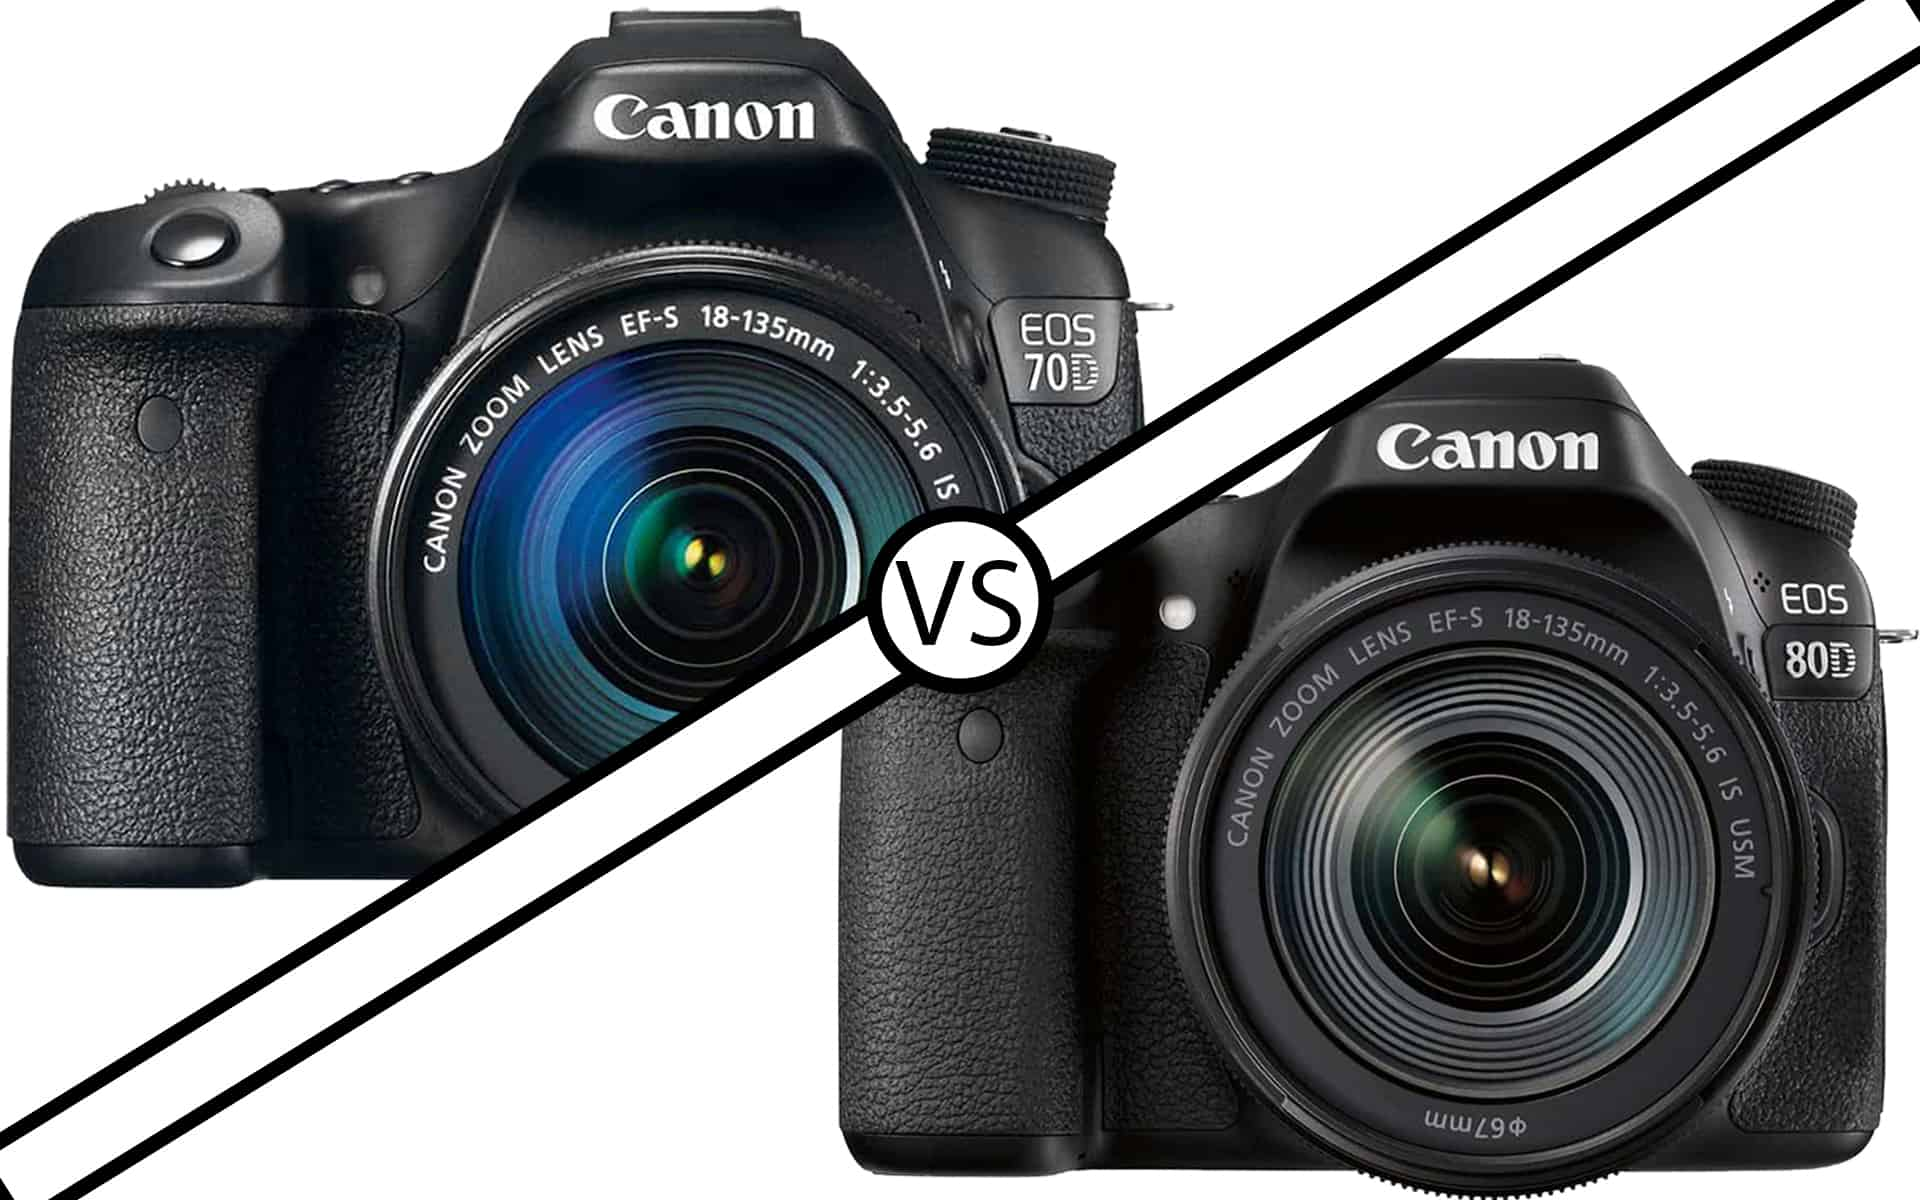 Canon 70D vs 80D